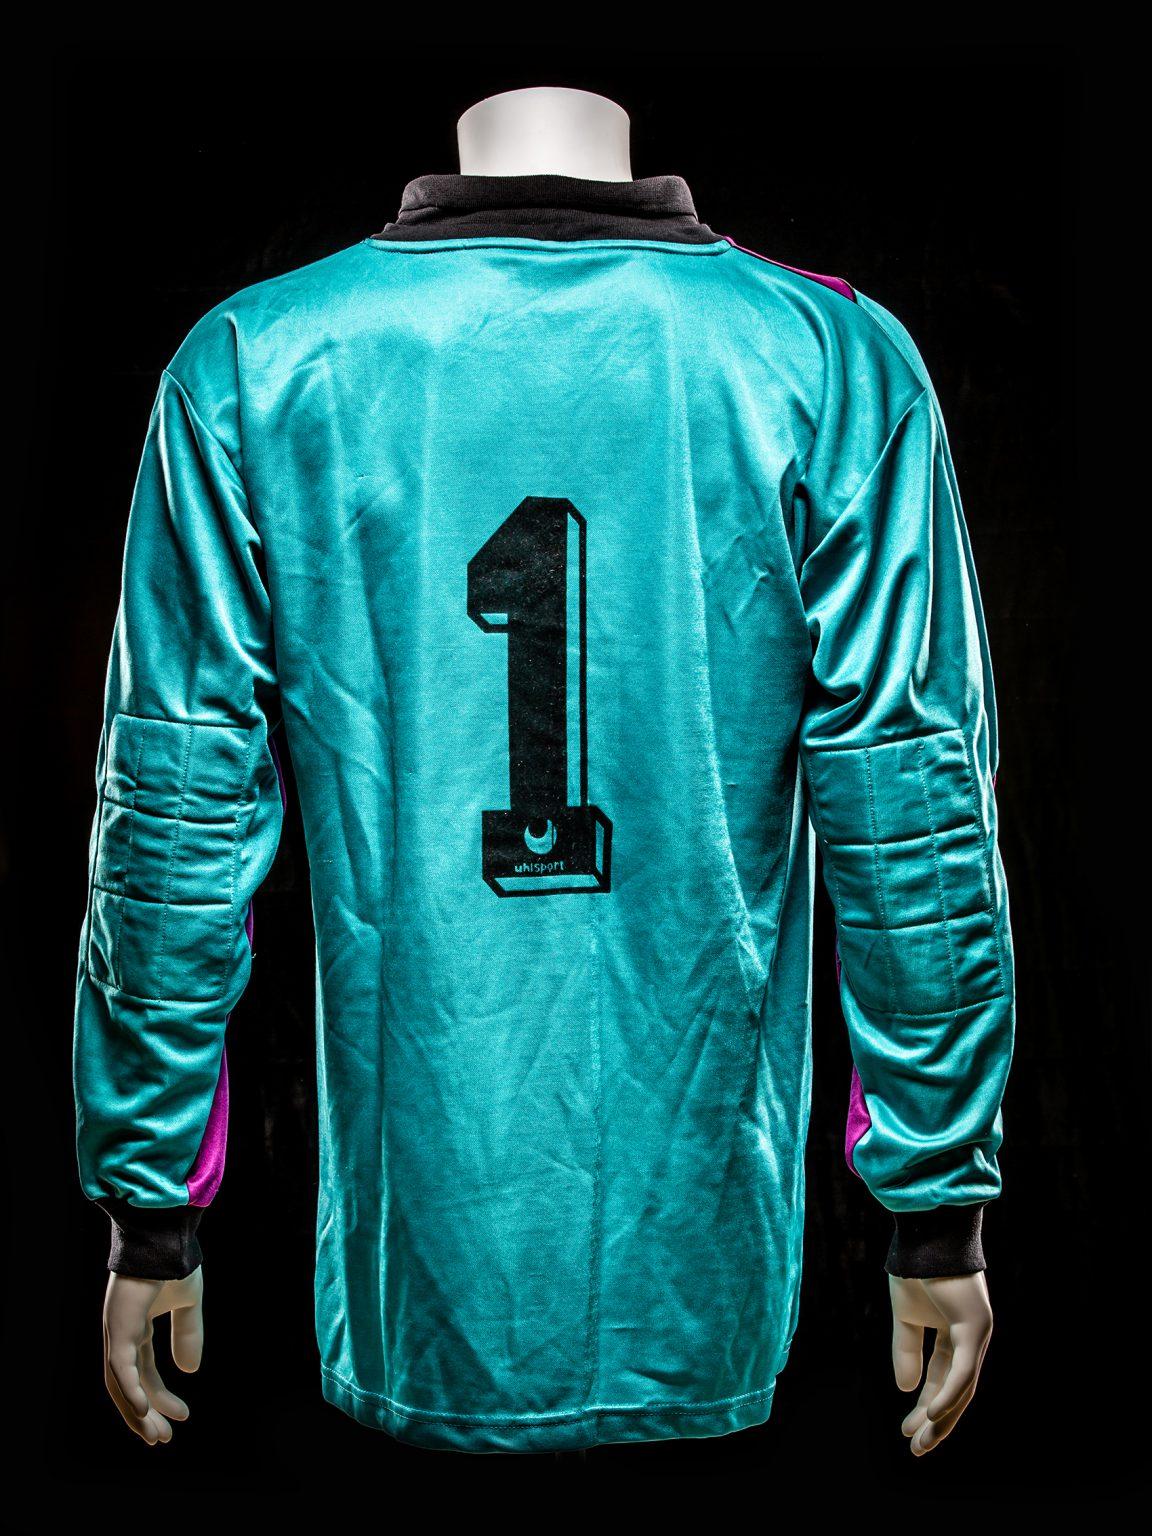 #1 Raimond van der Gouw